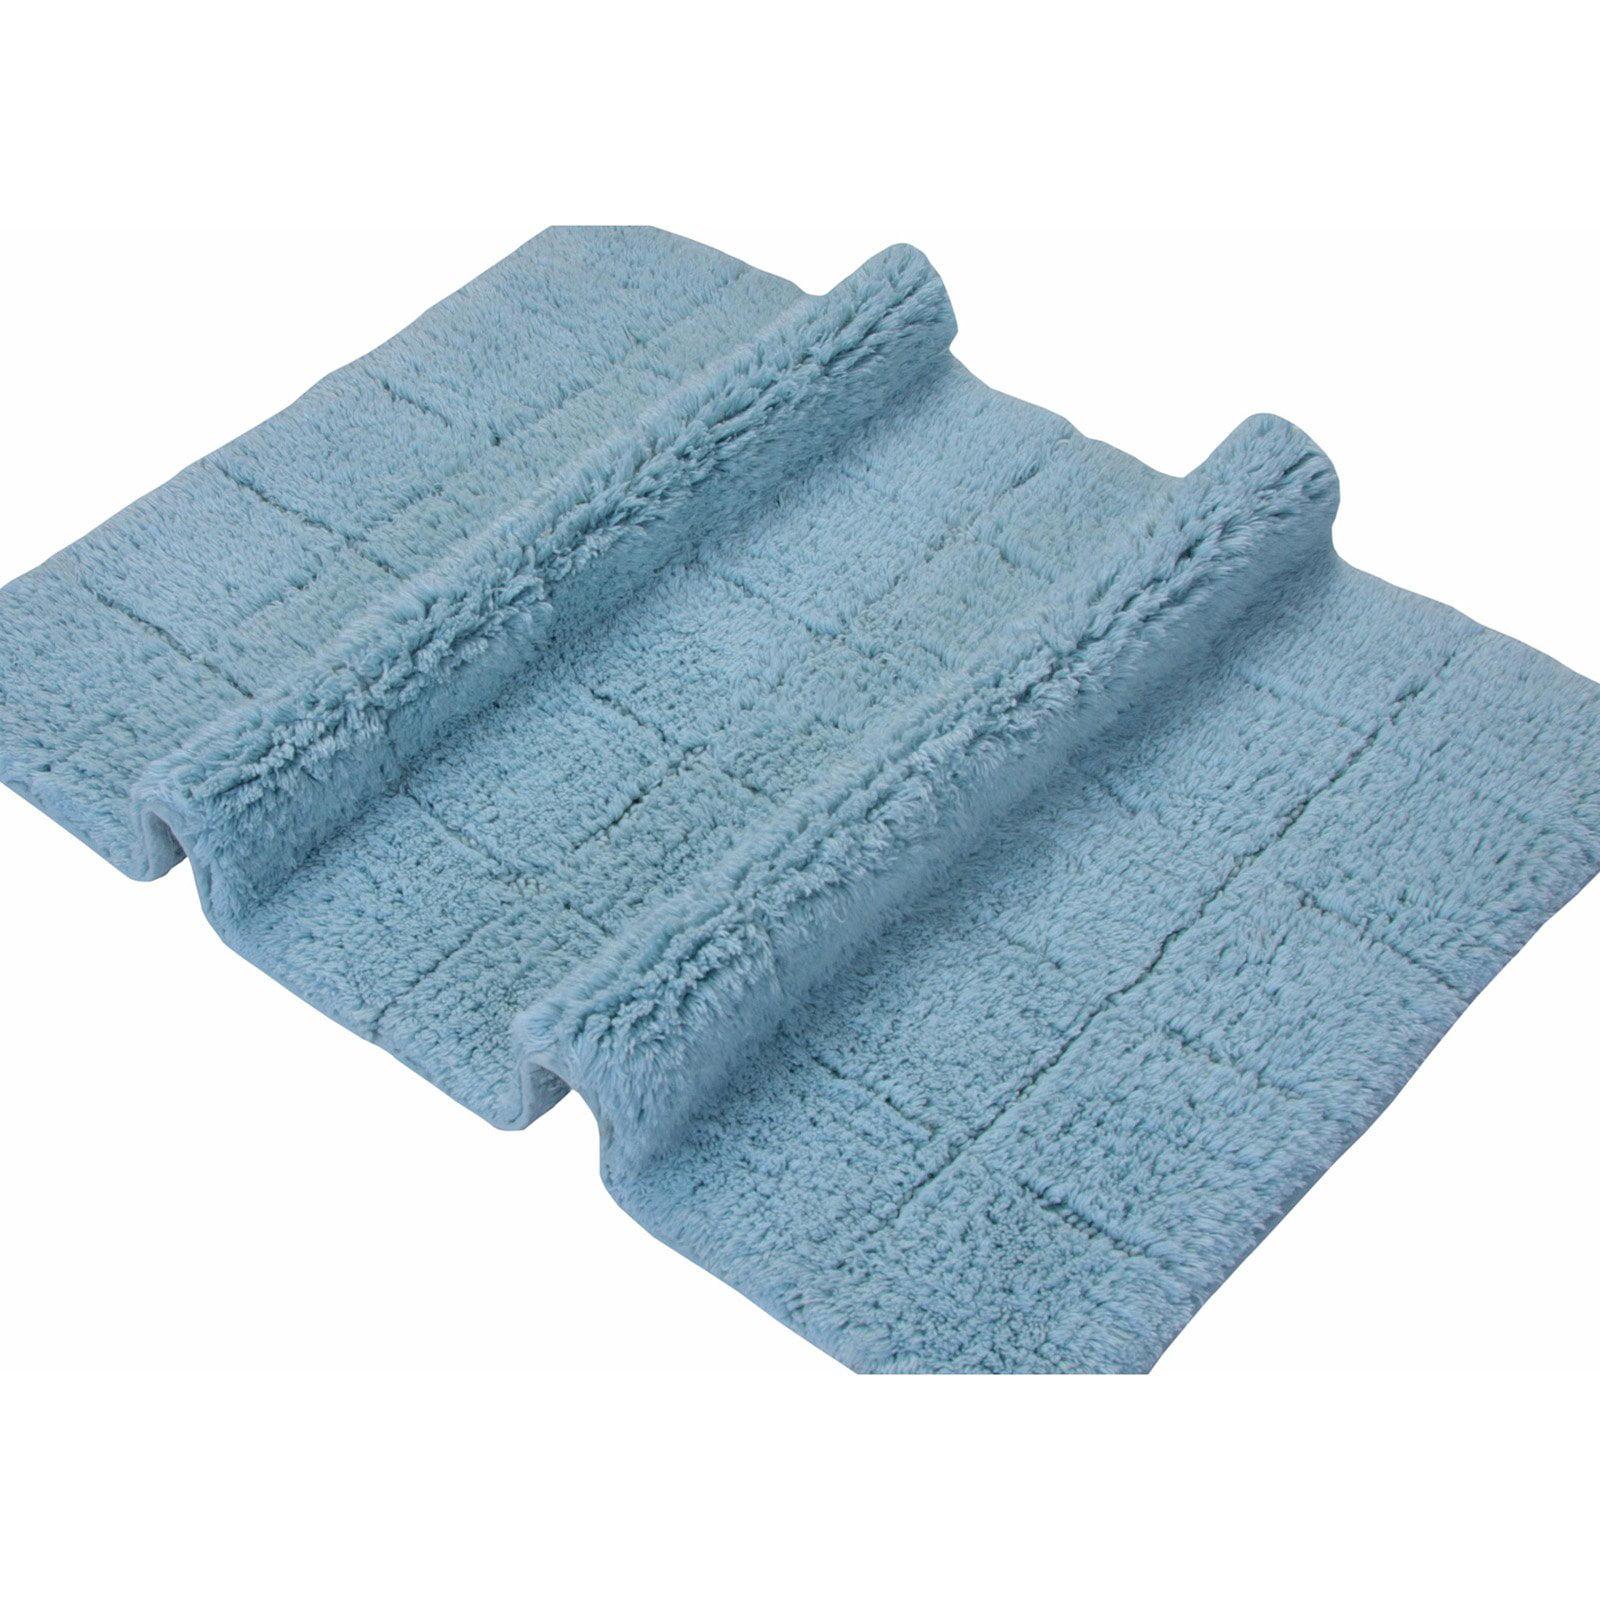 Textile Decor Elegance Collection Summer Tile Bath Rug